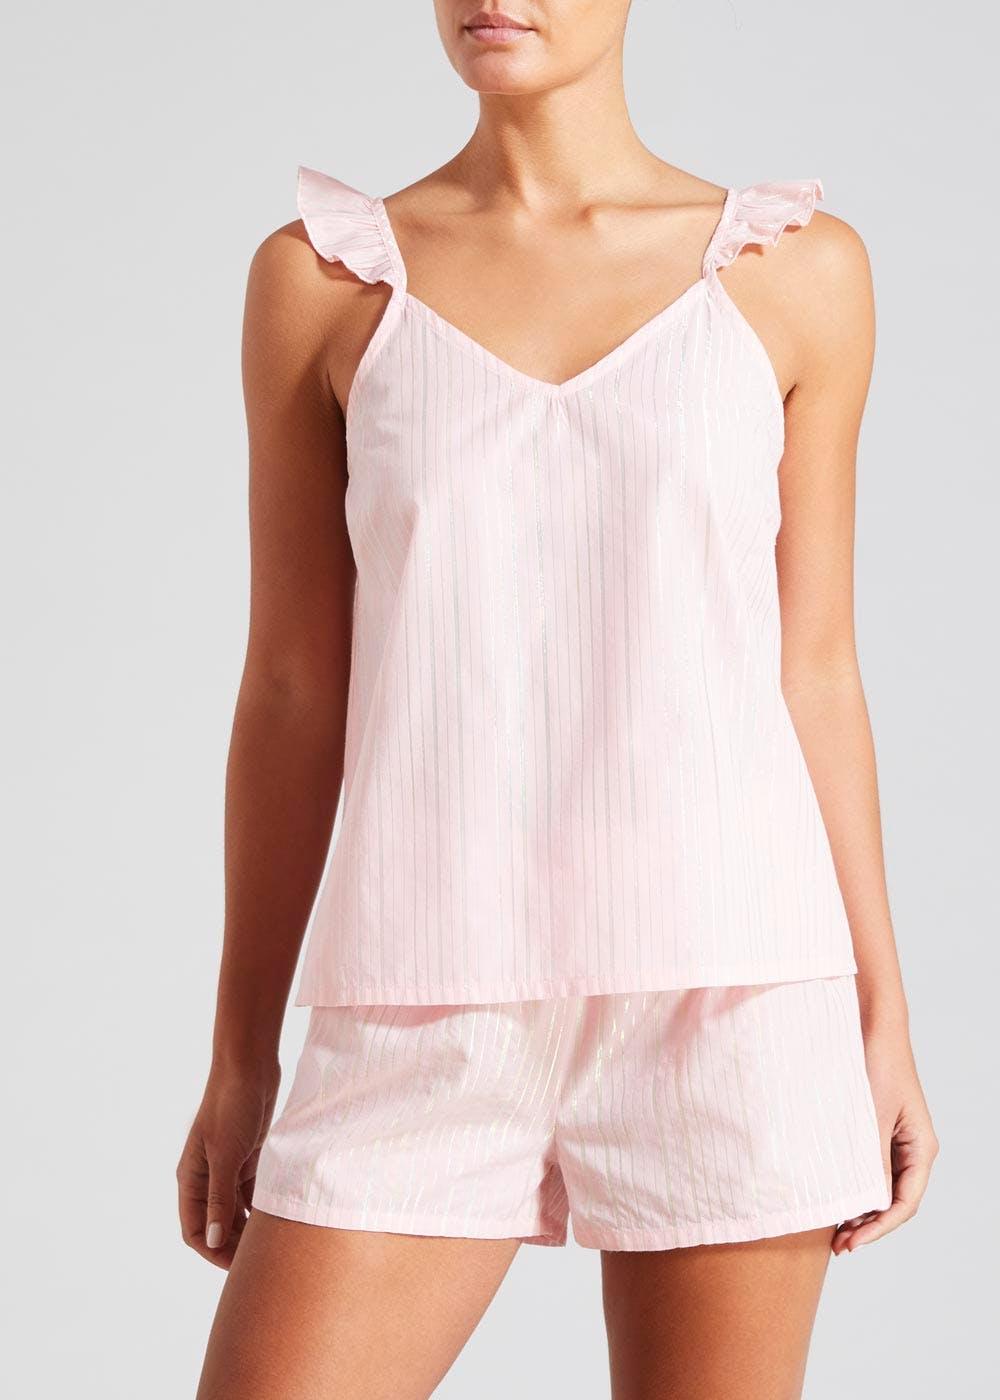 Shimmer Stripe Short Pyjamas Set, Sizes 14, 16, Now £4 @ Matalan ( Free Click & Collect )